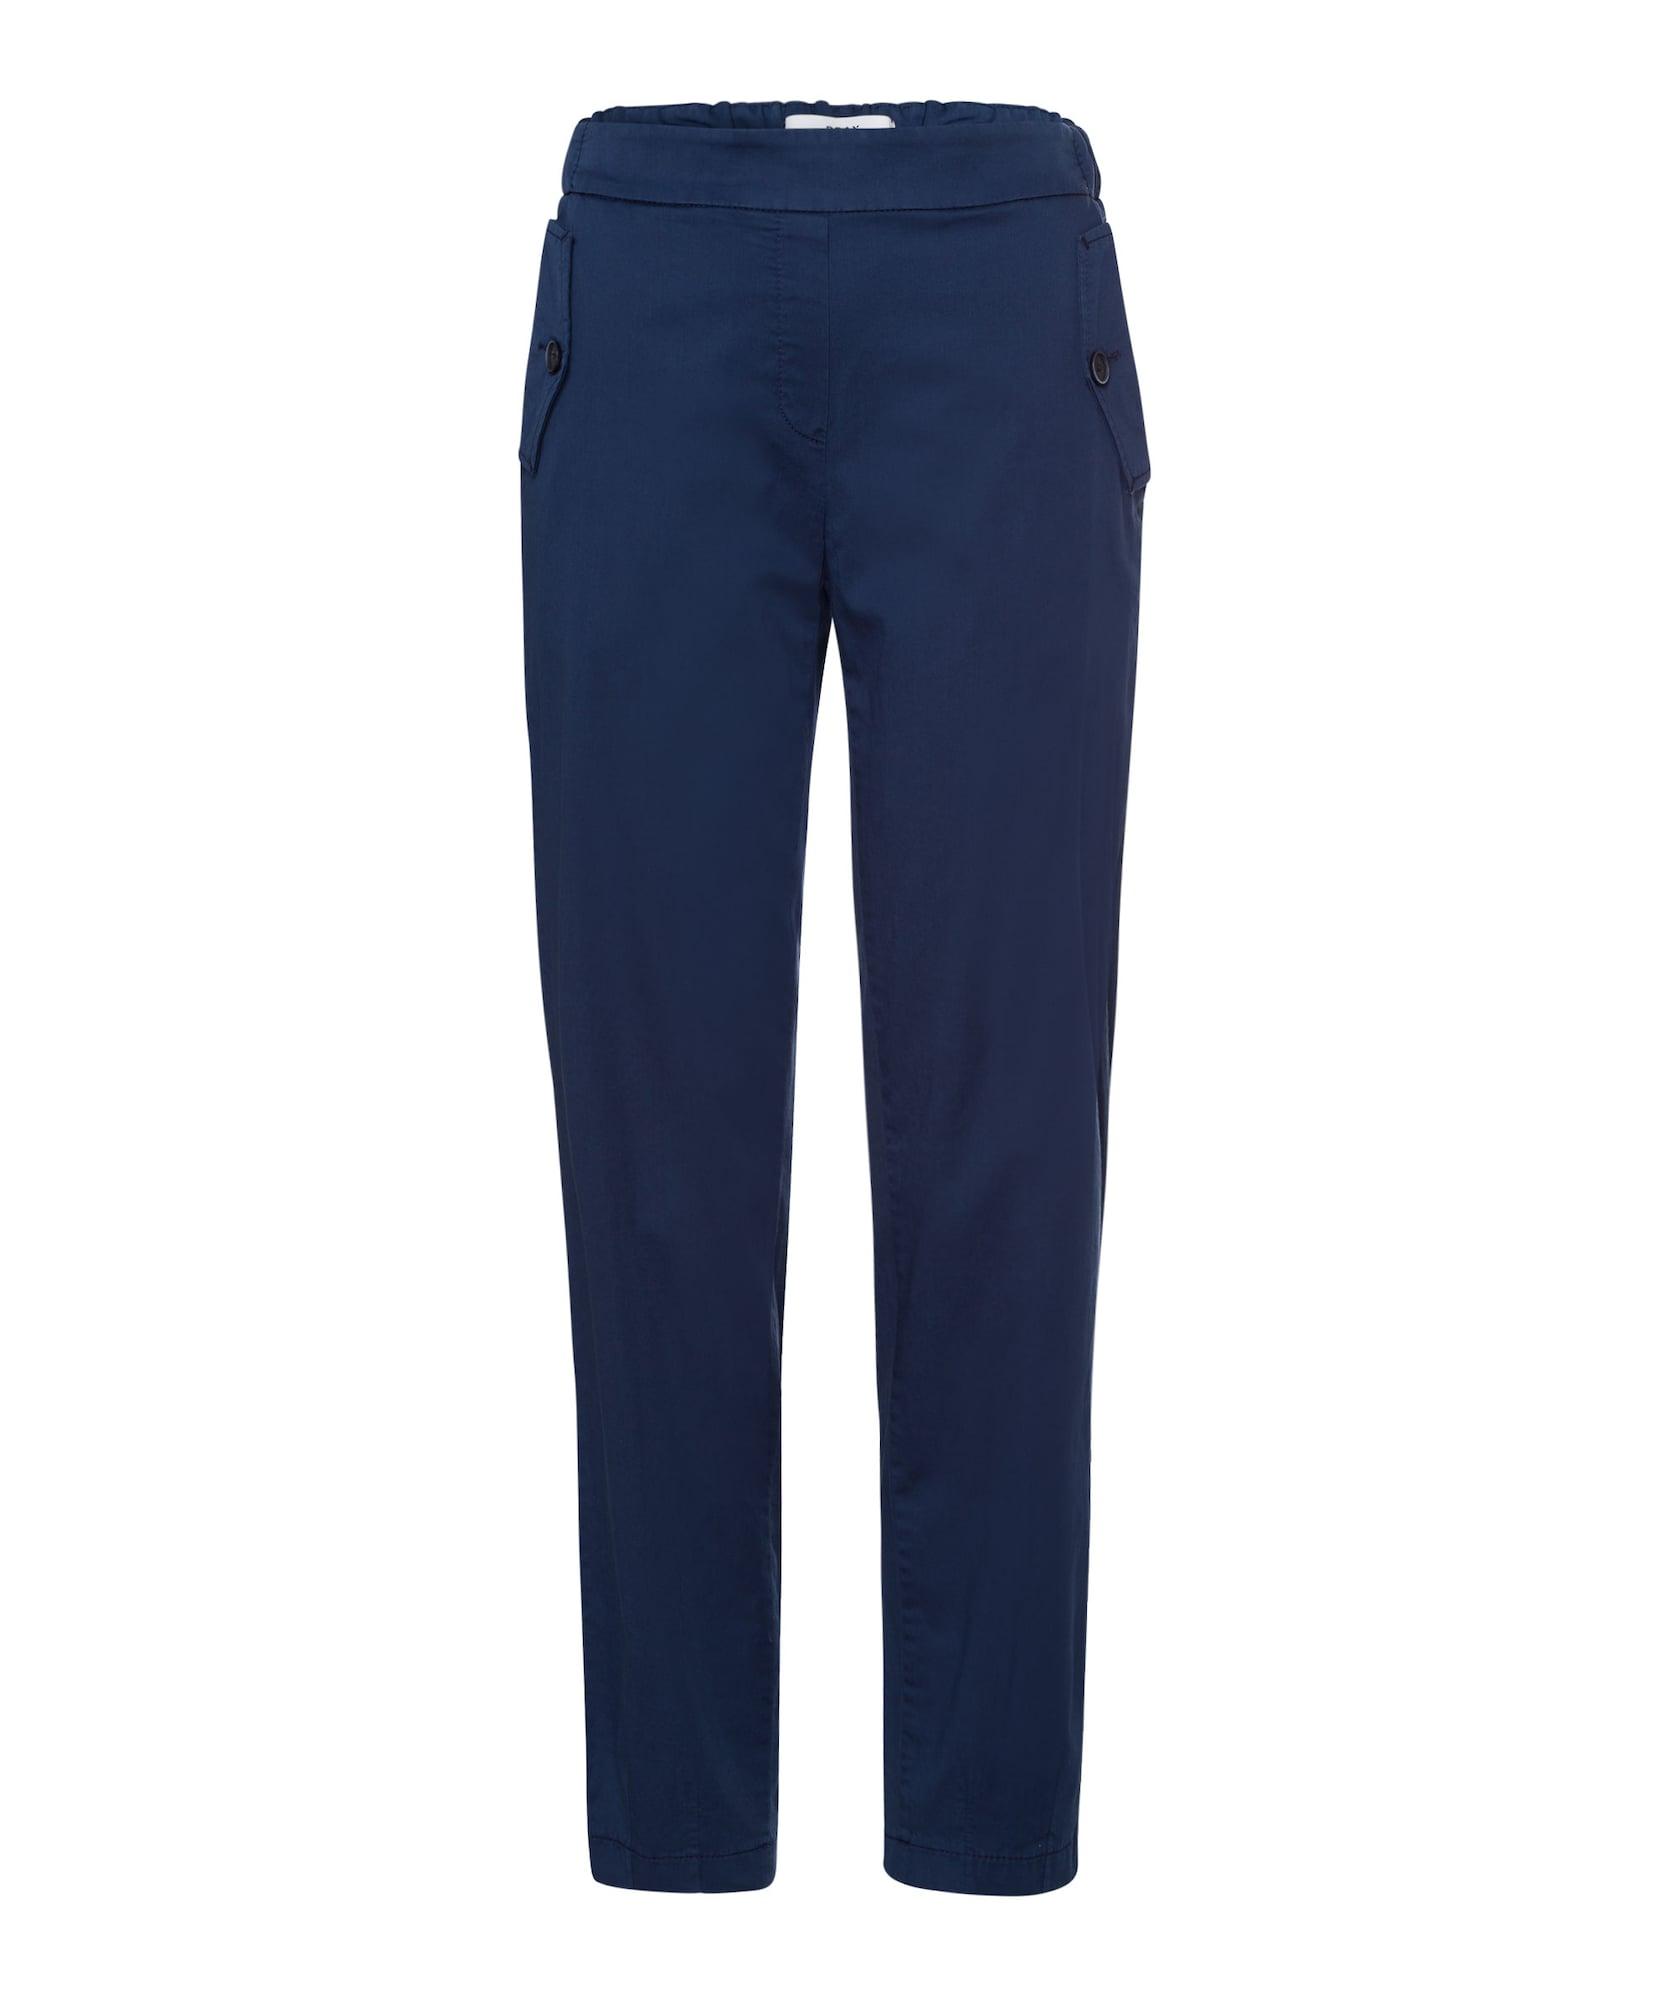 BRAX Kelnės 'Mareen' indigo spalva